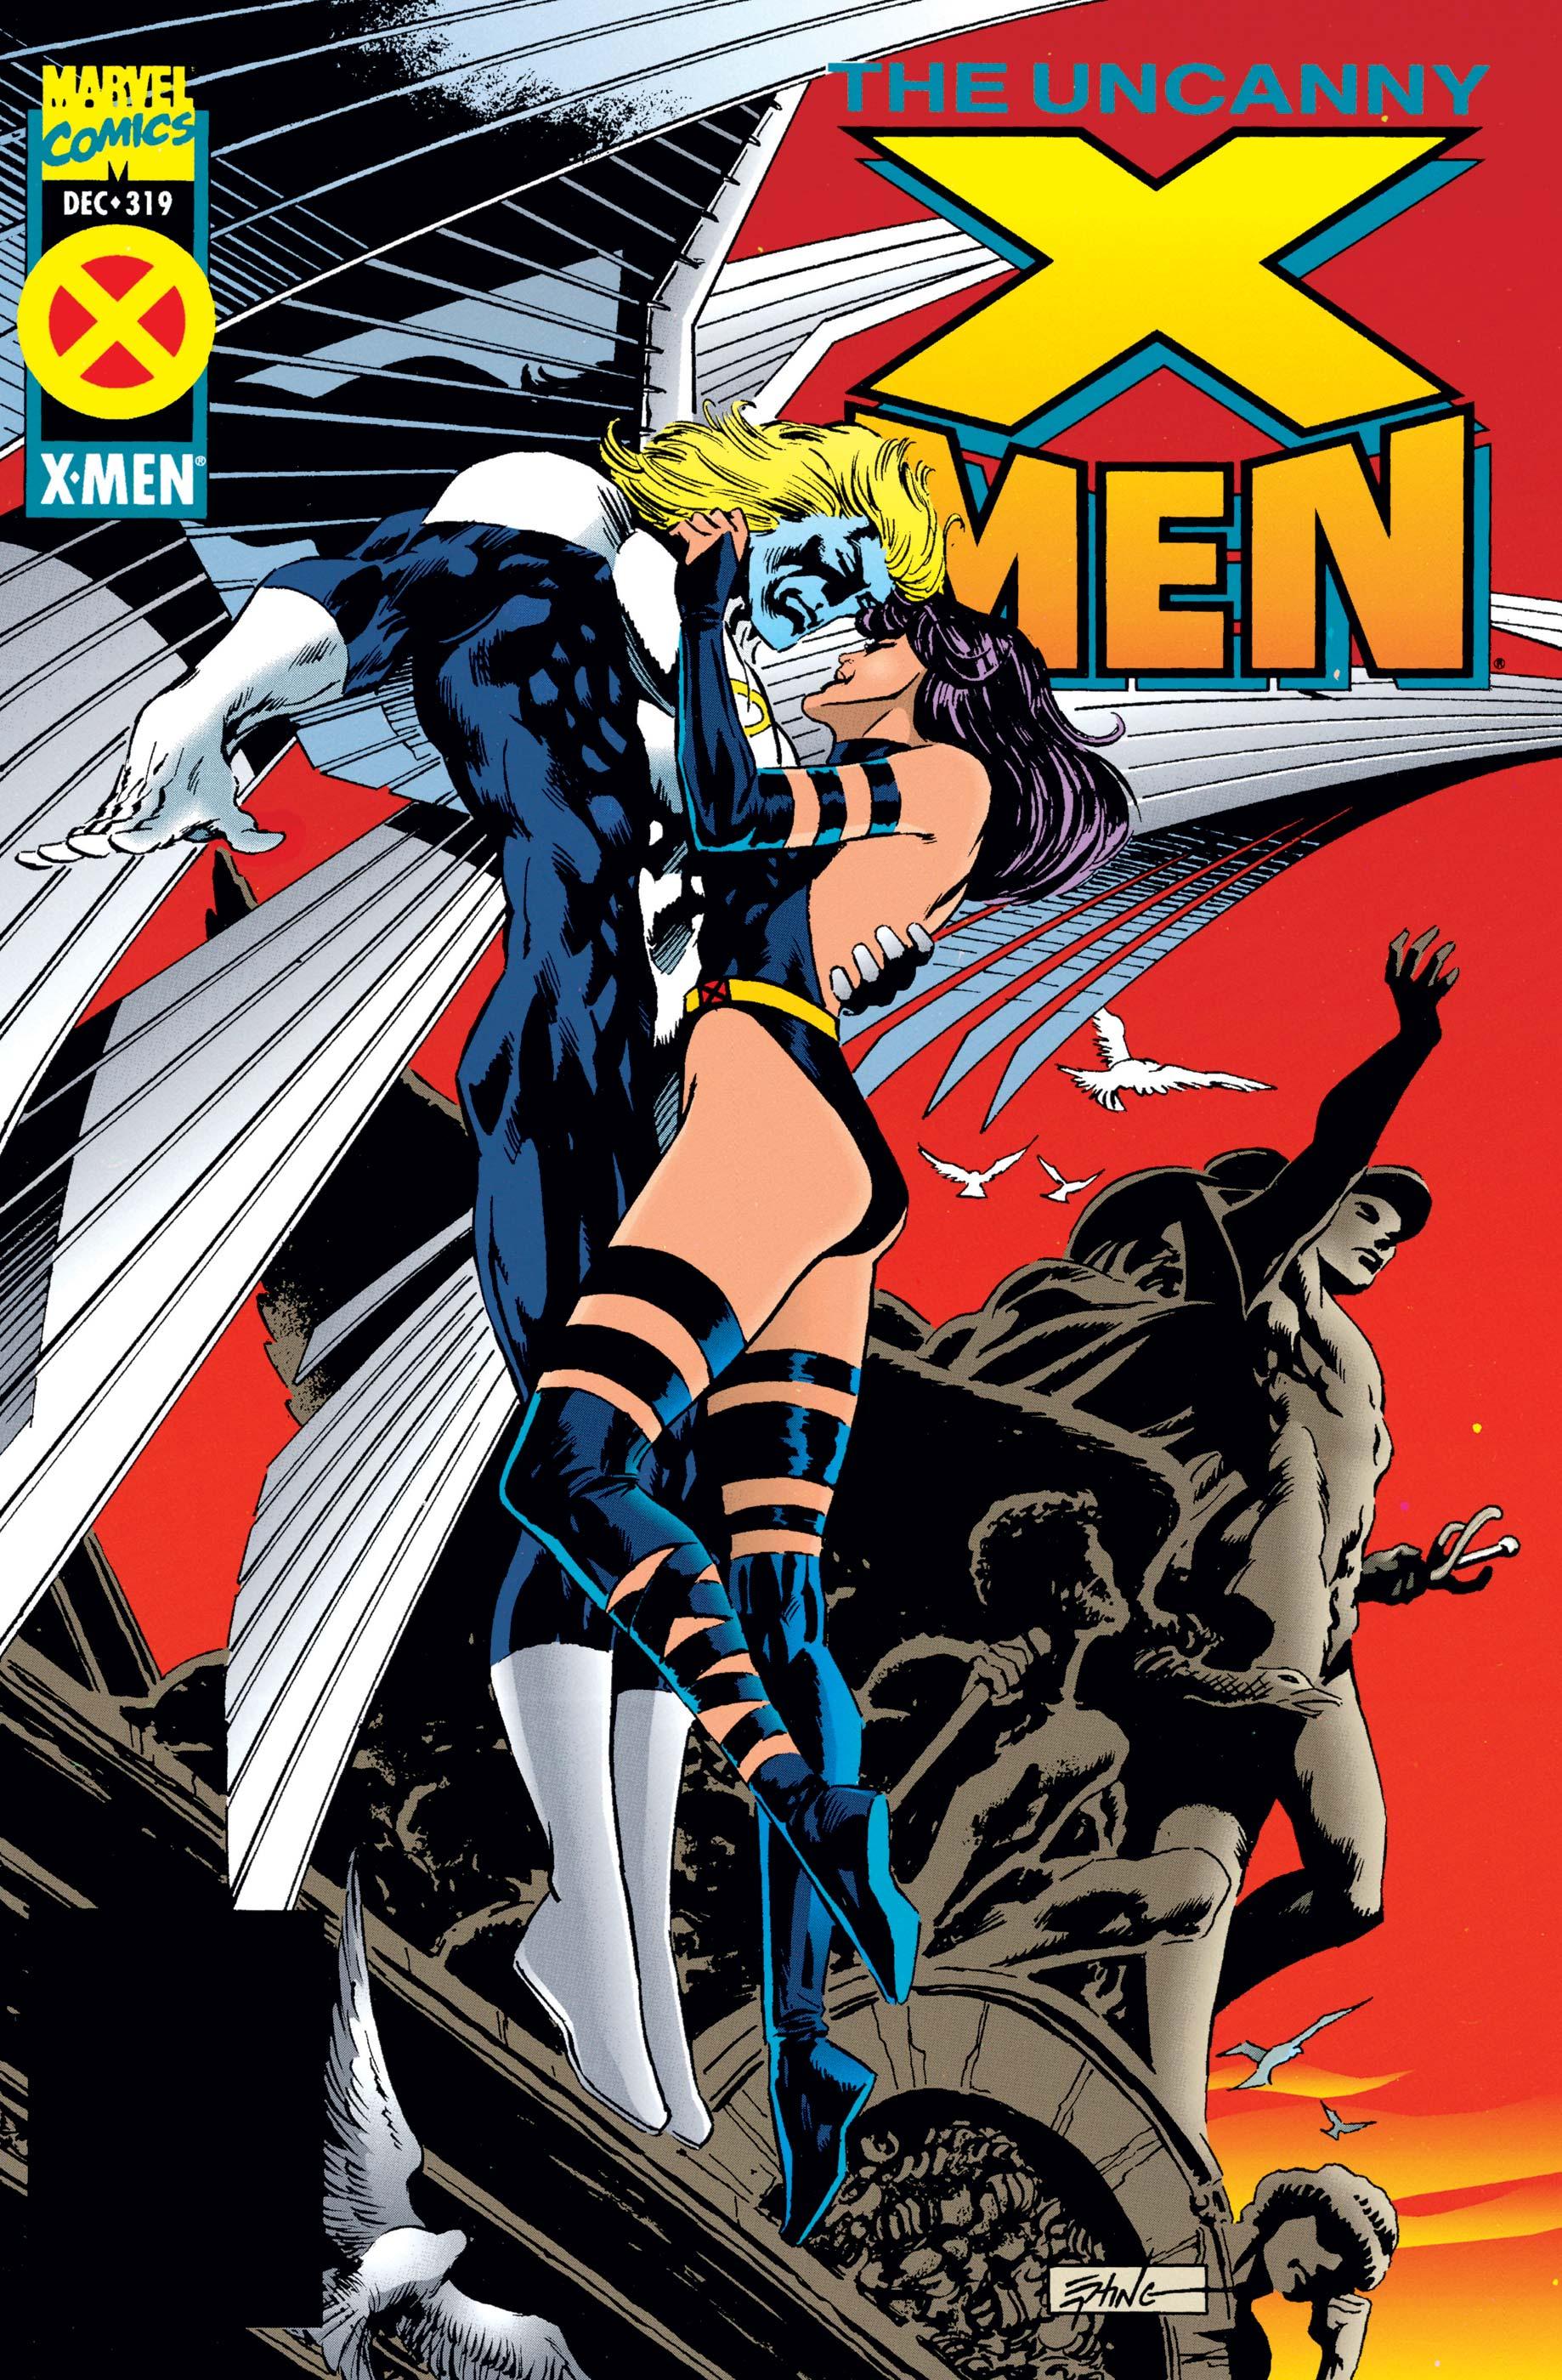 Uncanny X-Men (1963) #319